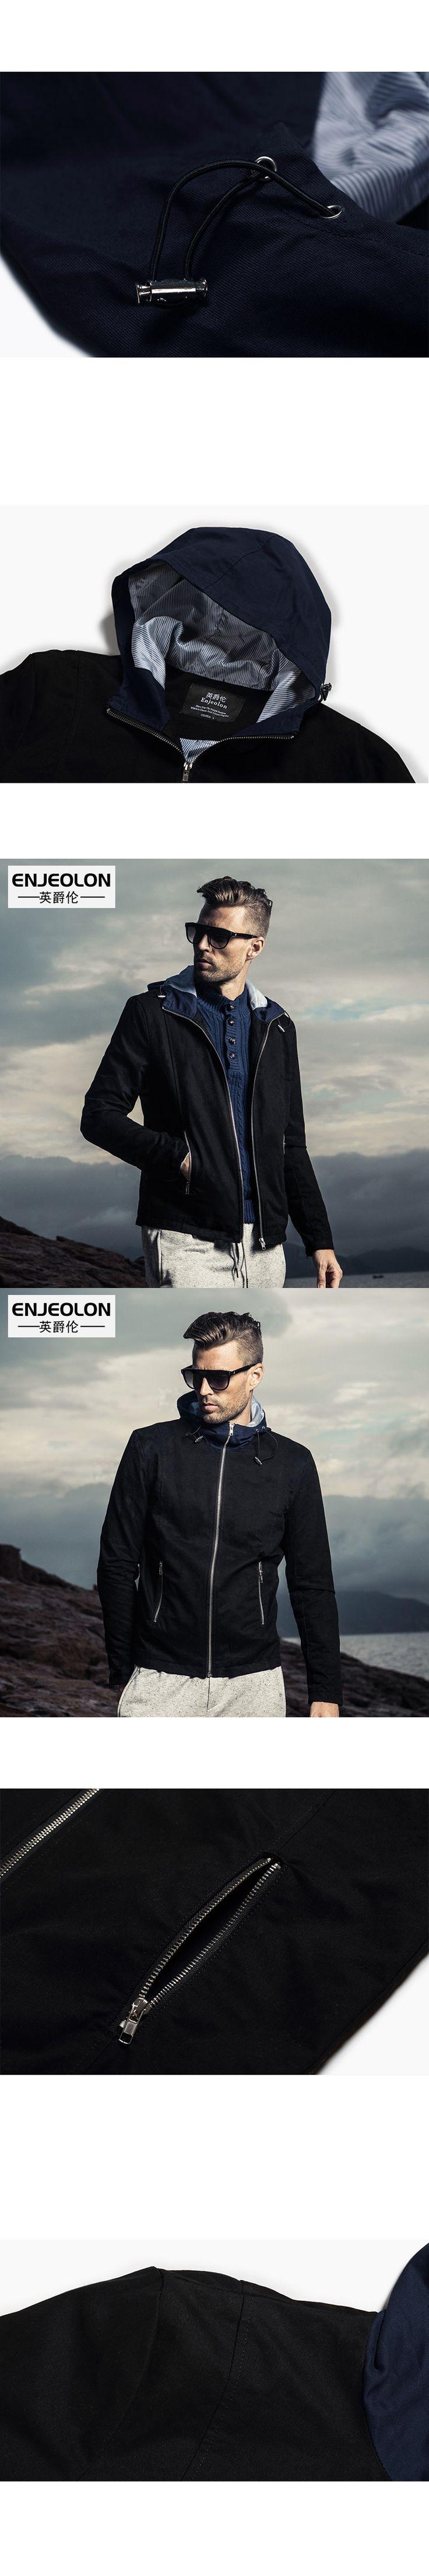 Enjeolon brand 2017 hoodcy Bomber windbreaker jackets men, fashion black solid Mens coats, hoodie collar Men cool clothes WT2006